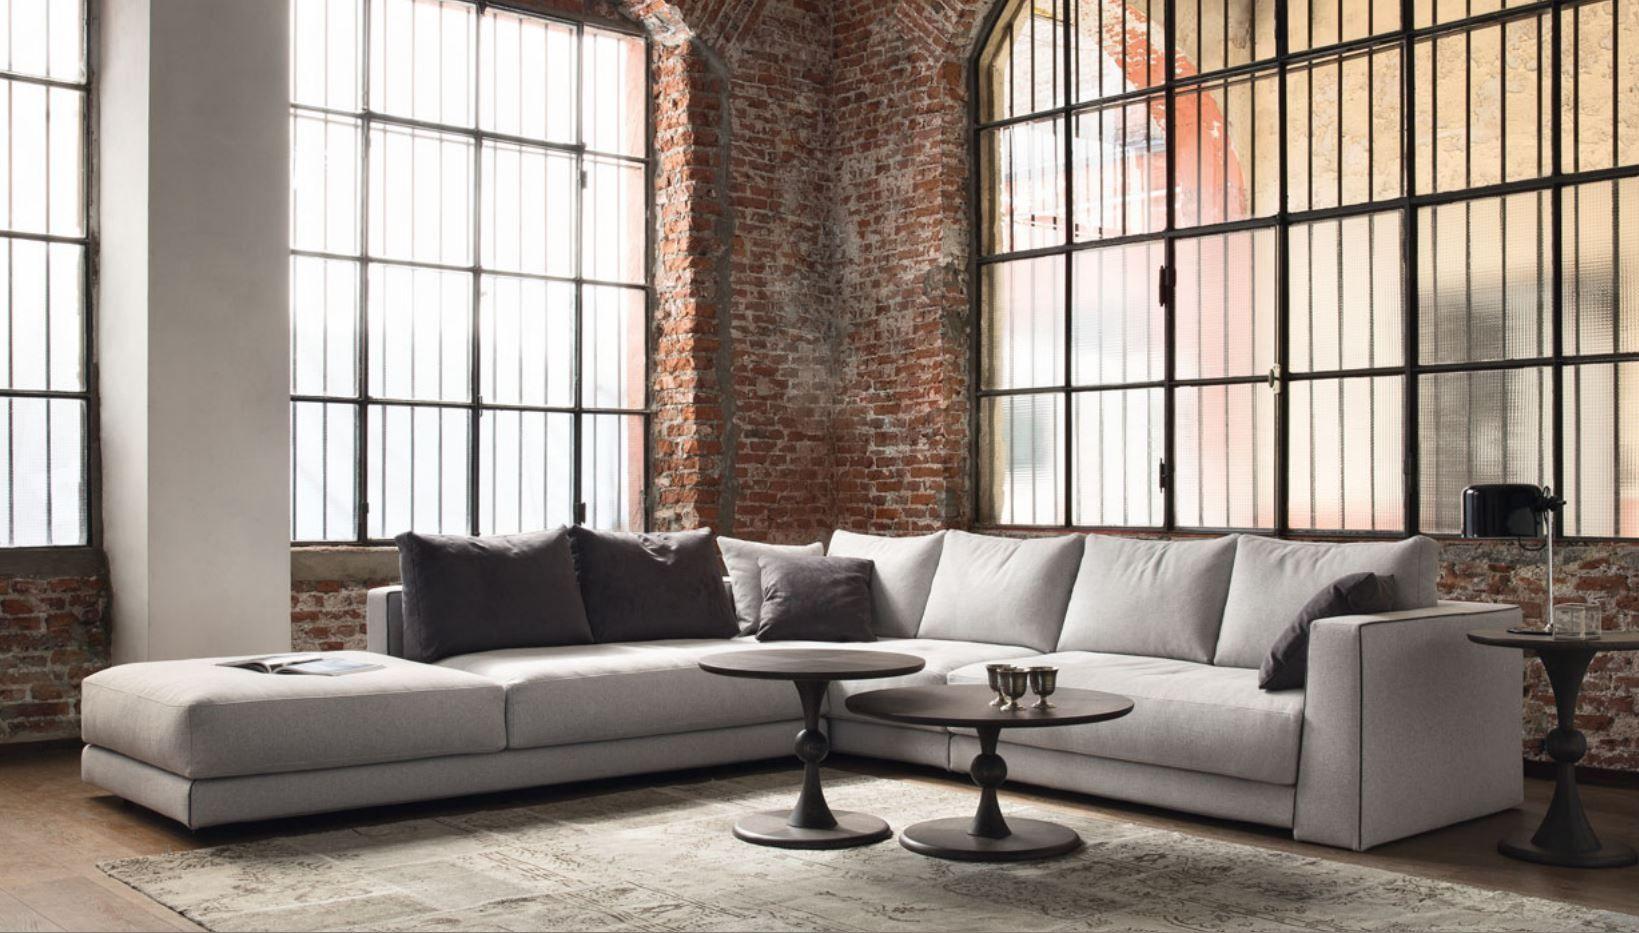 Modern Design Sectional Sofas Italian Sofa Designs Sofa Design Luxury Leather Sofas